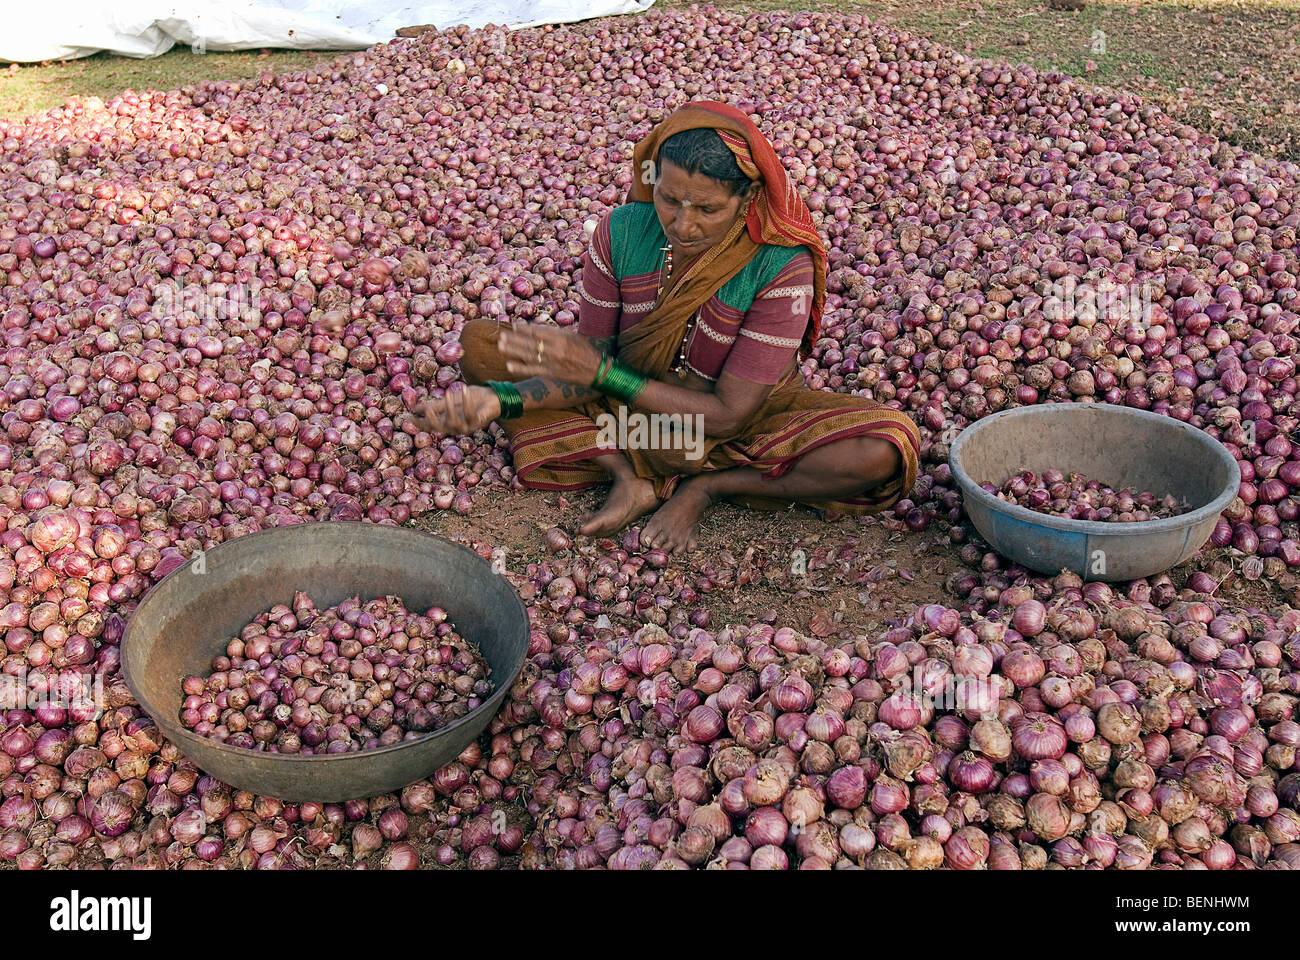 A woman grading onions harvested from the fields Pattadakal Karnataka India - Stock Image